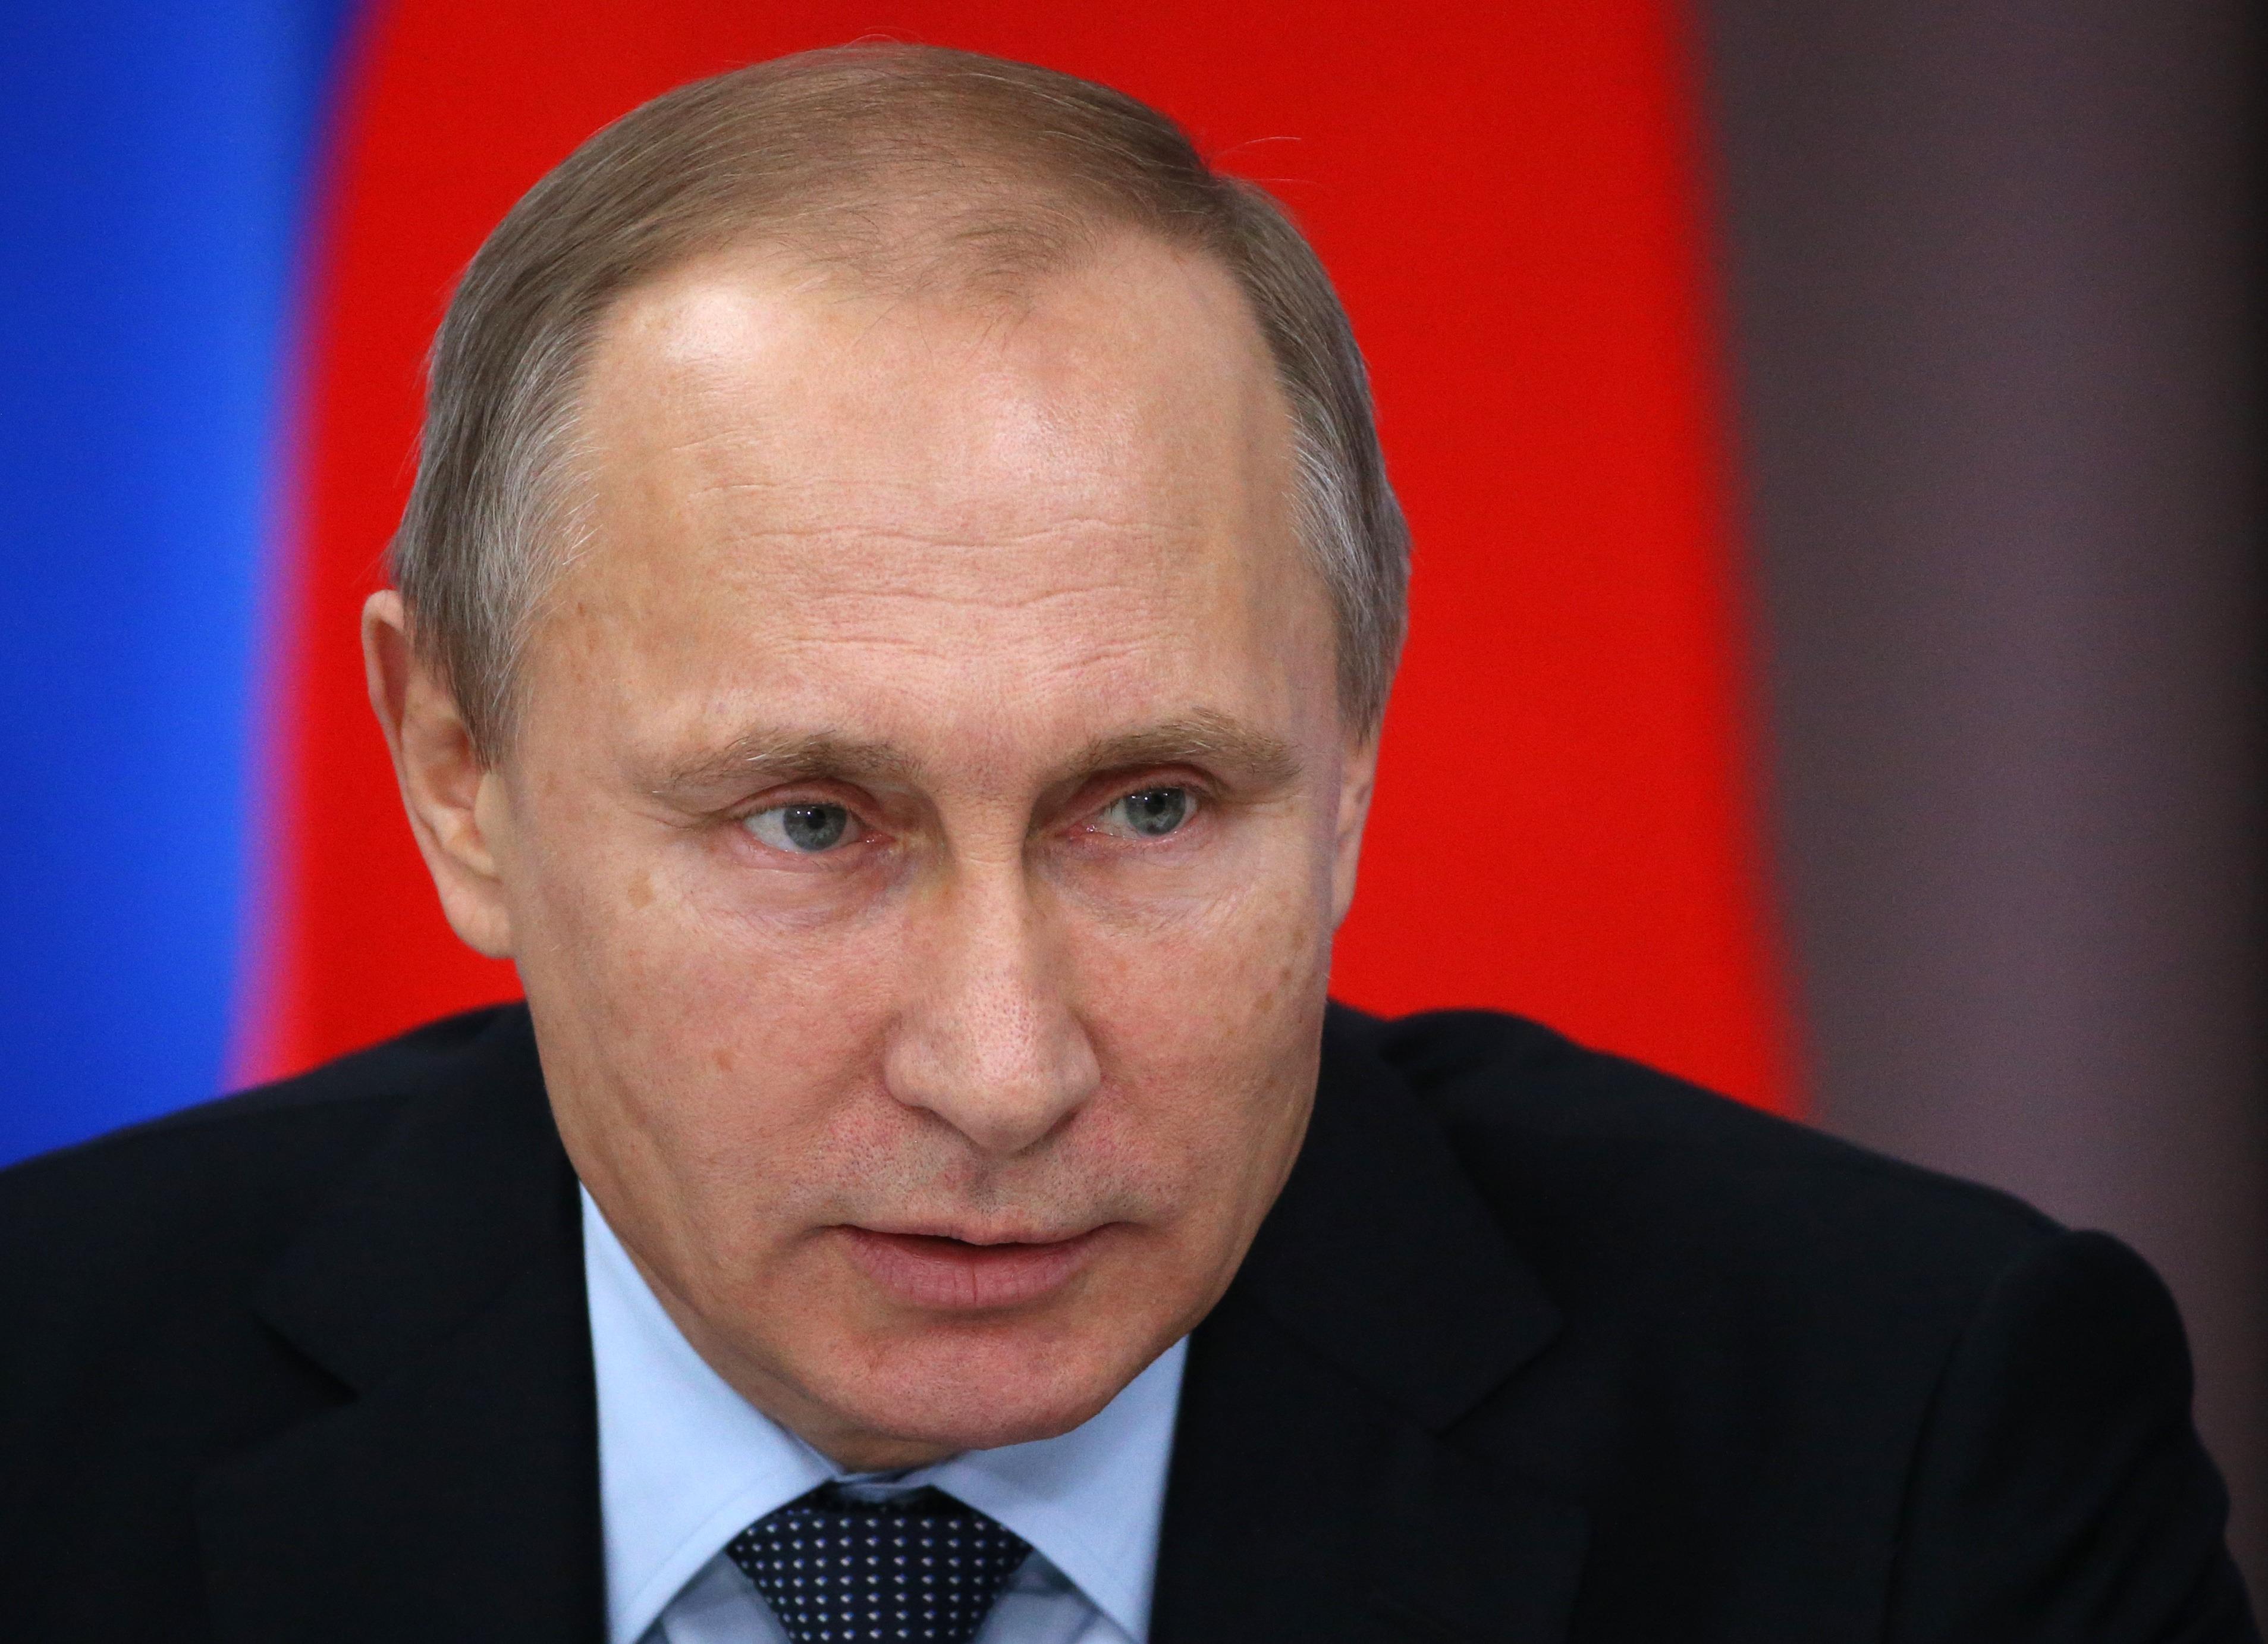 Vladimir Putin Attends State Council Presidium Meeting